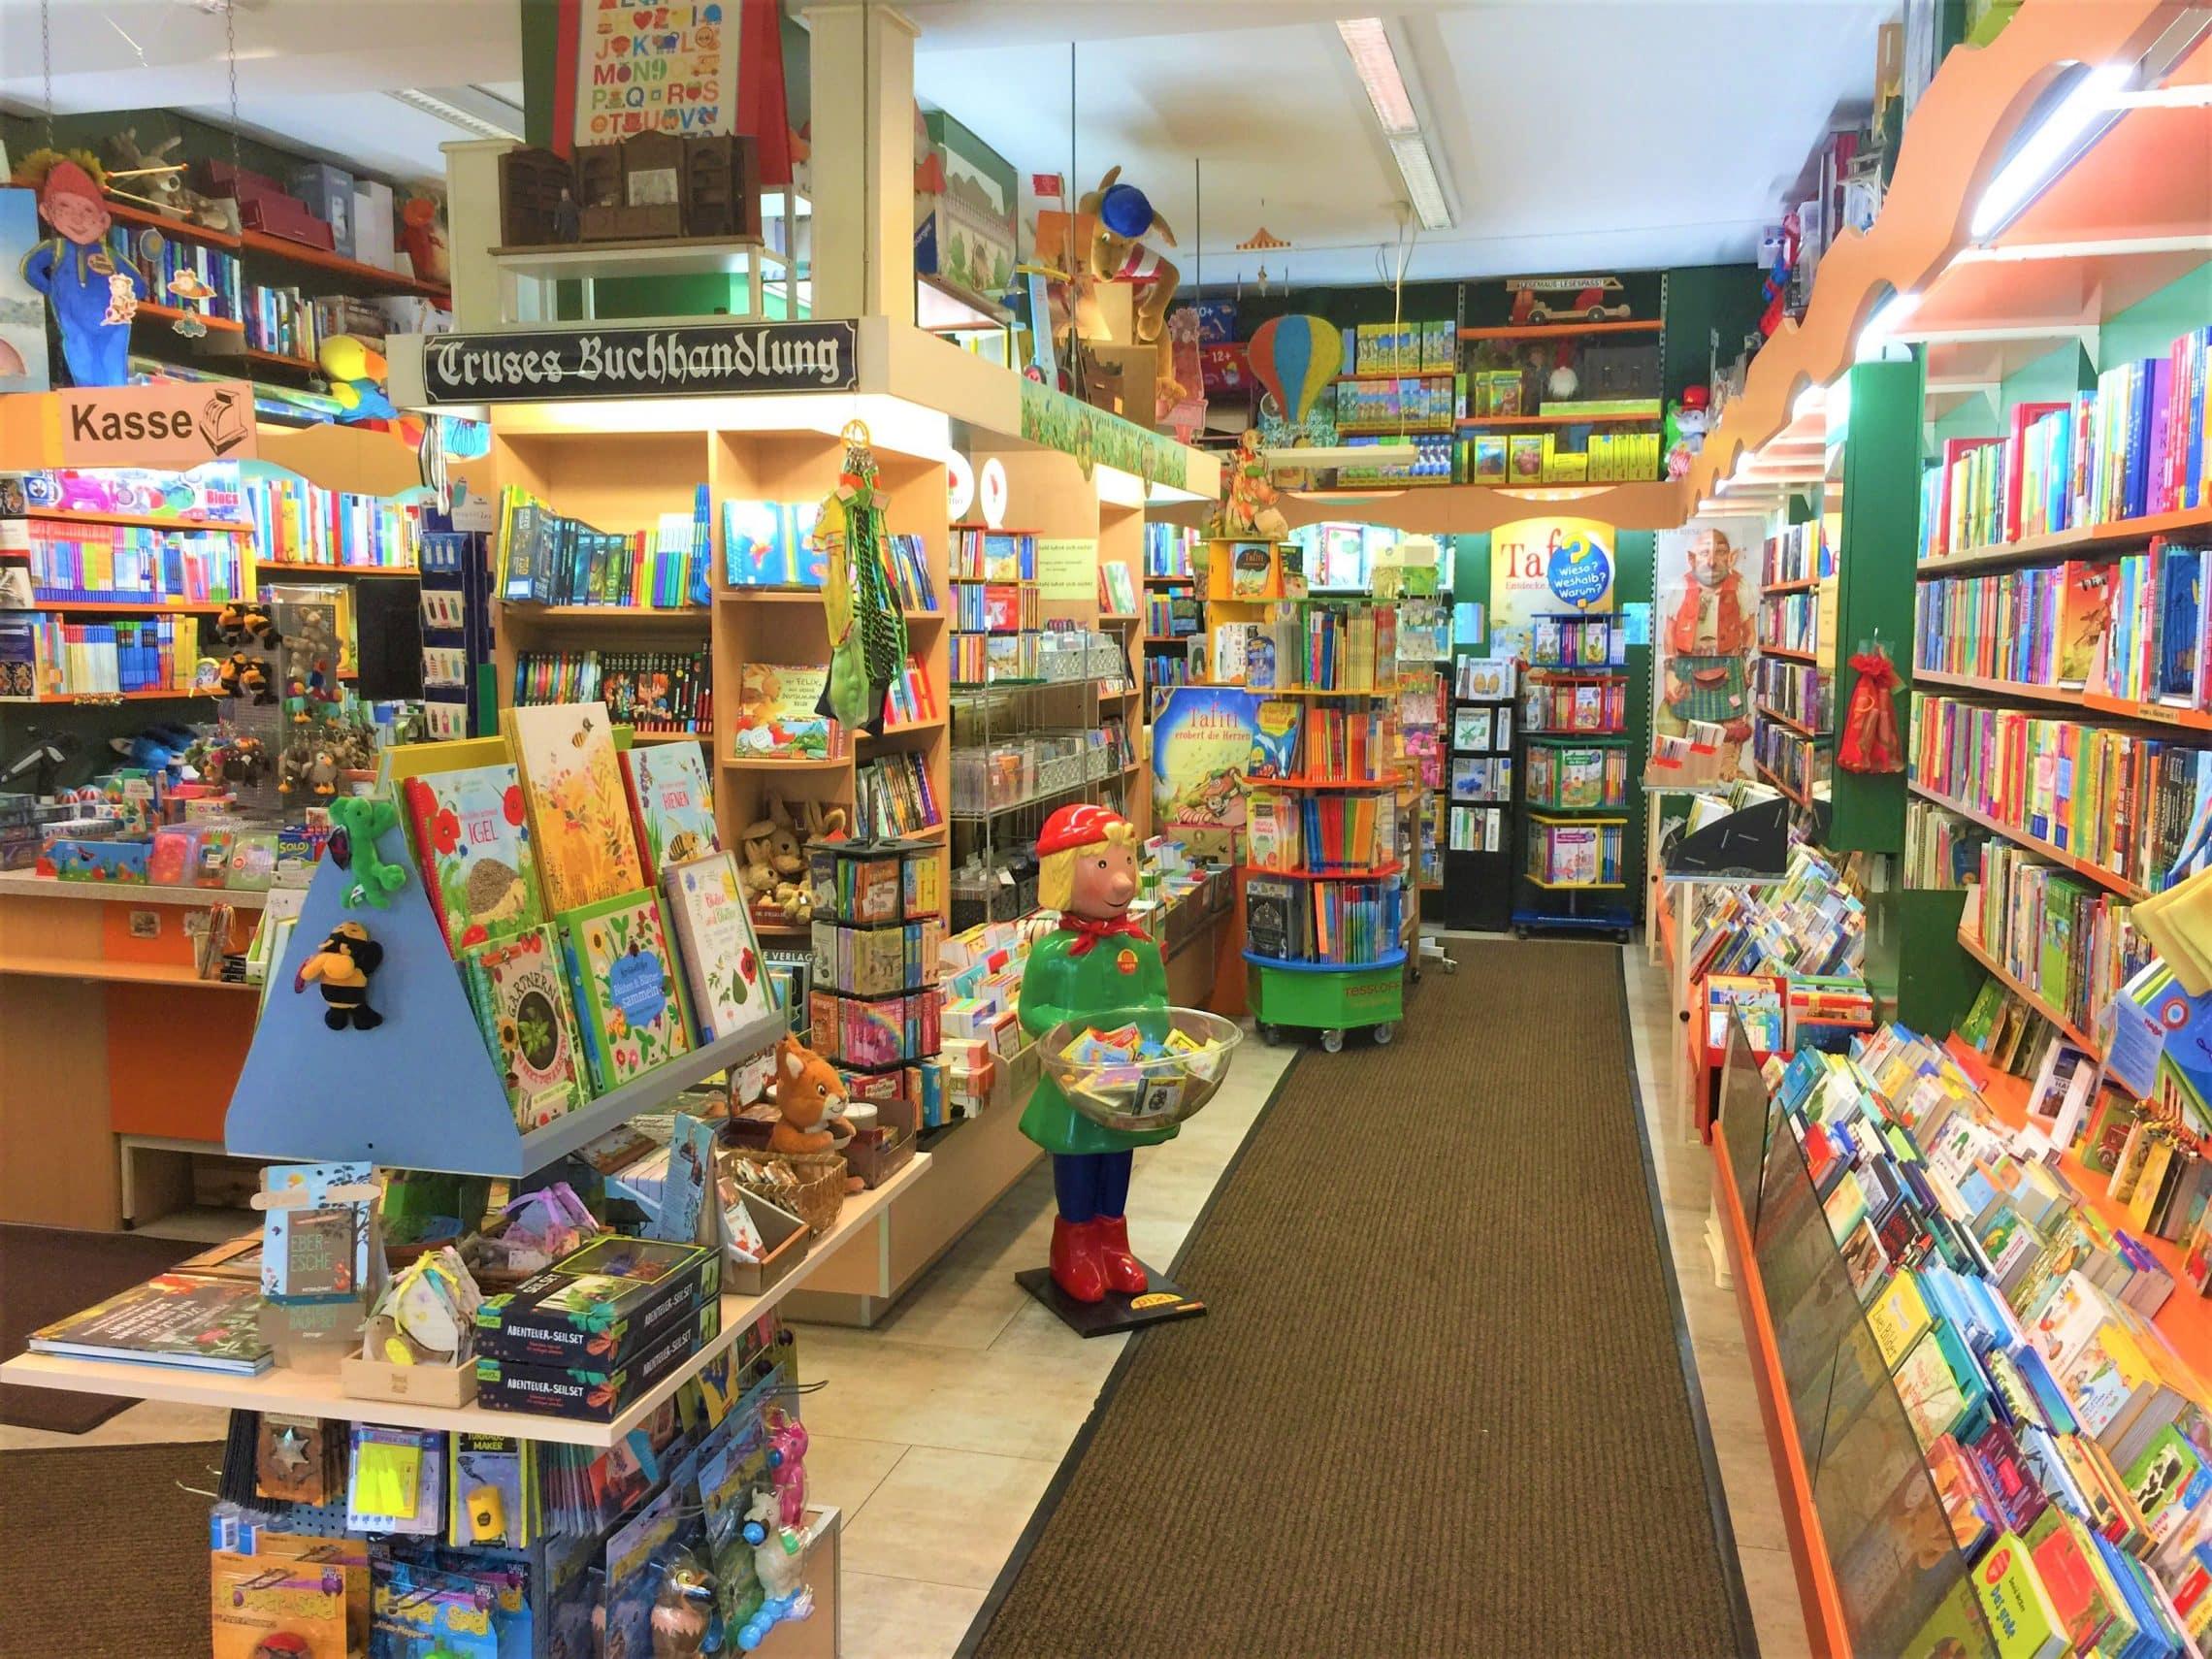 Style Hannover Cruses Buchhandlung B 1 - CRUSES Buchhandlung Kinder- und Jugendbuch